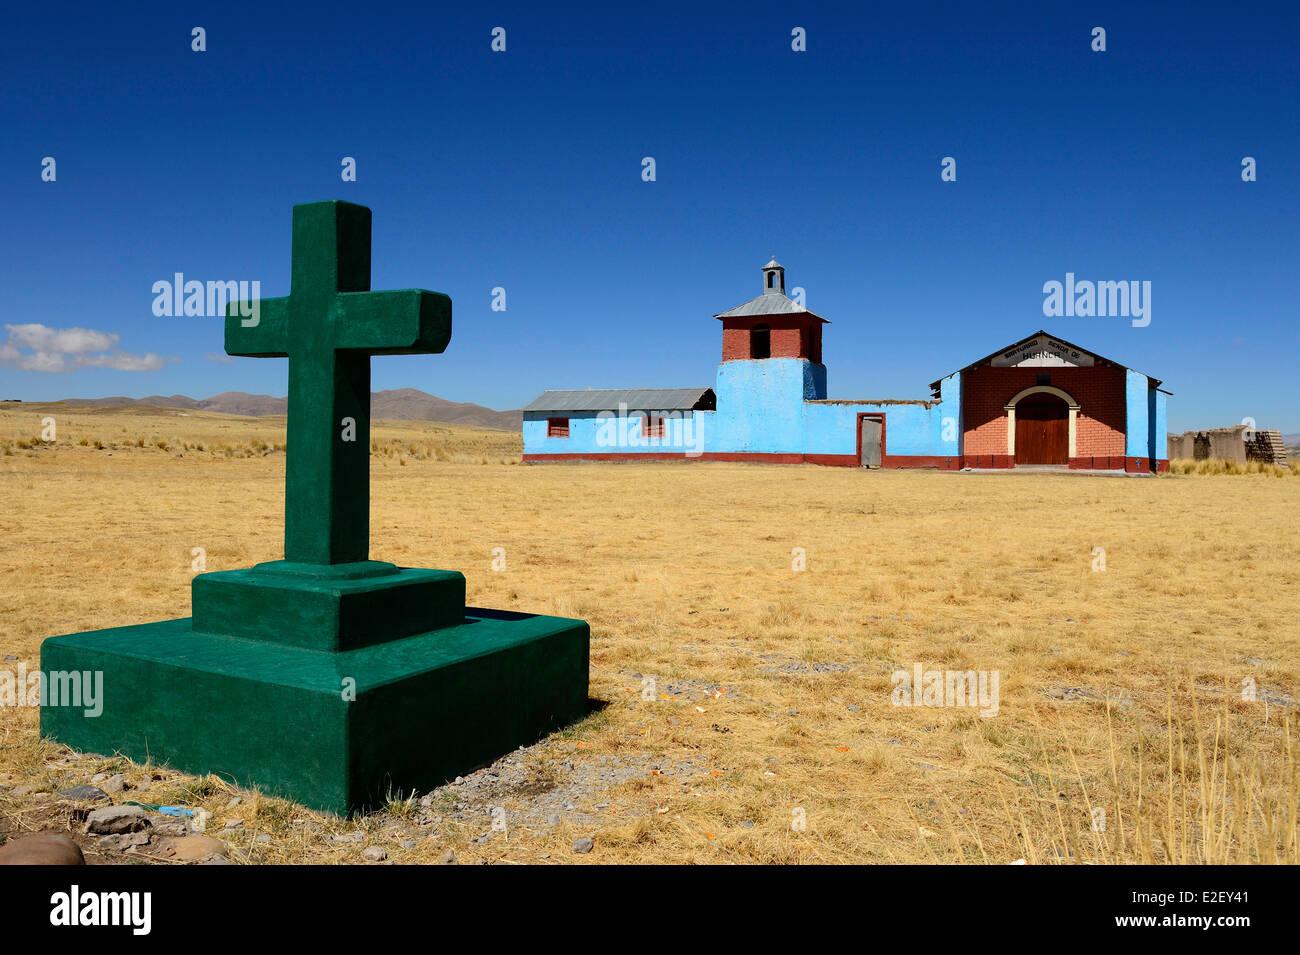 Peru, Arequipa Provinz, Caylloma, verlorene Kirche mitten im Altiplano Stockbild